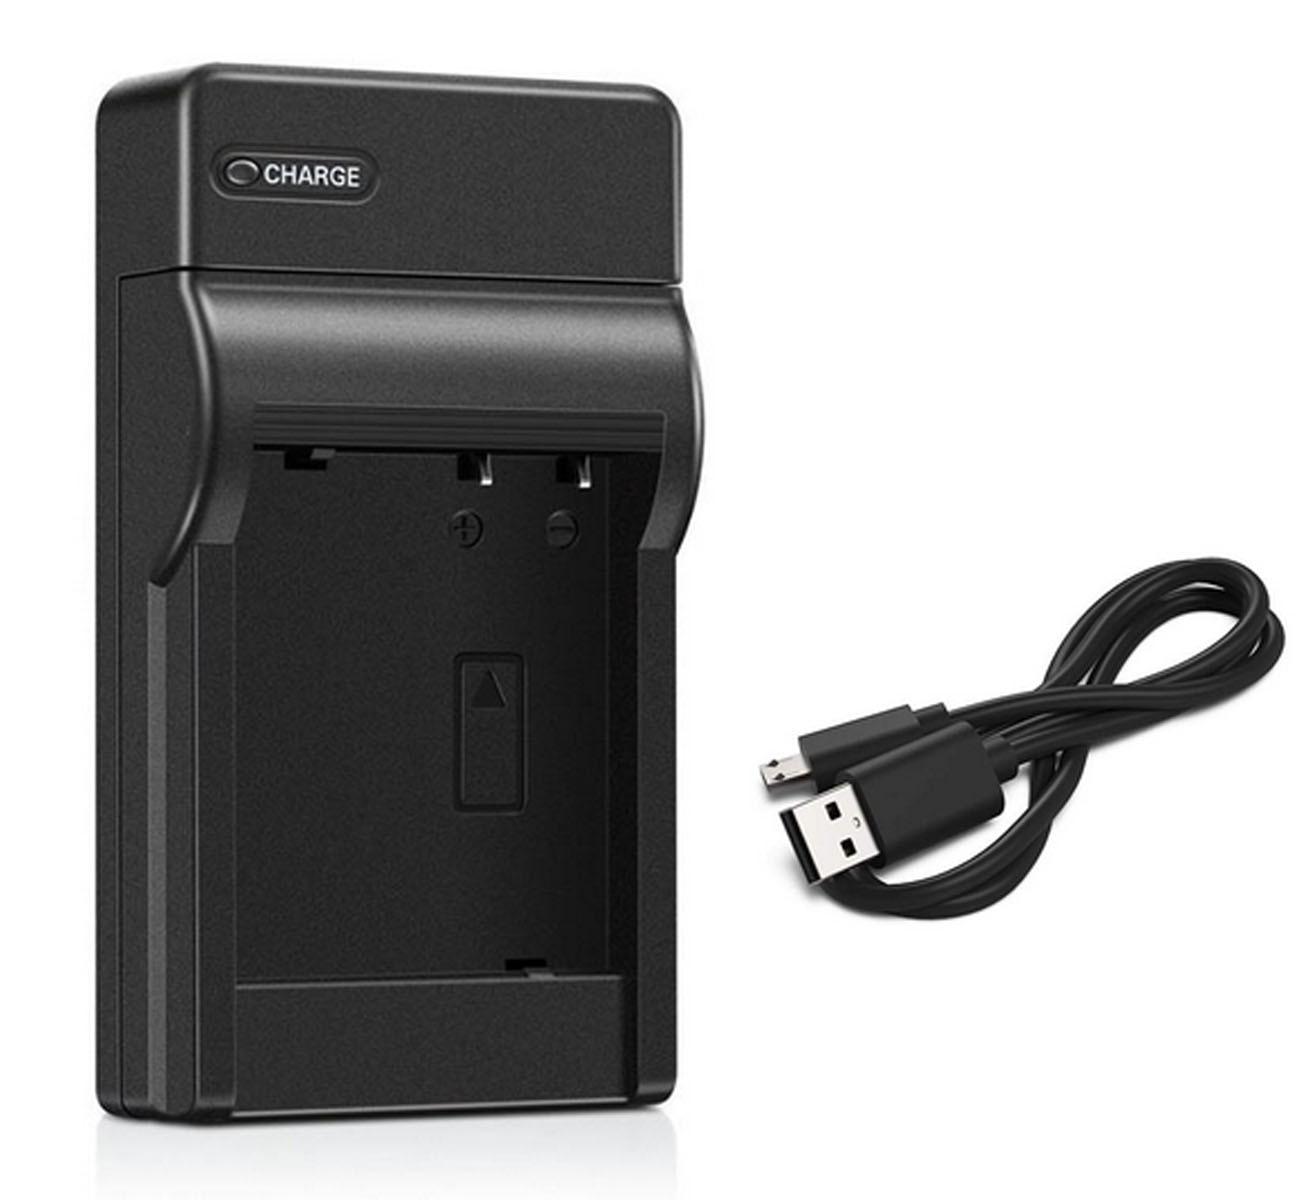 Carregador de bateria para canon dc310, dc320, dc330, dc410, dc420 dvd filmadora